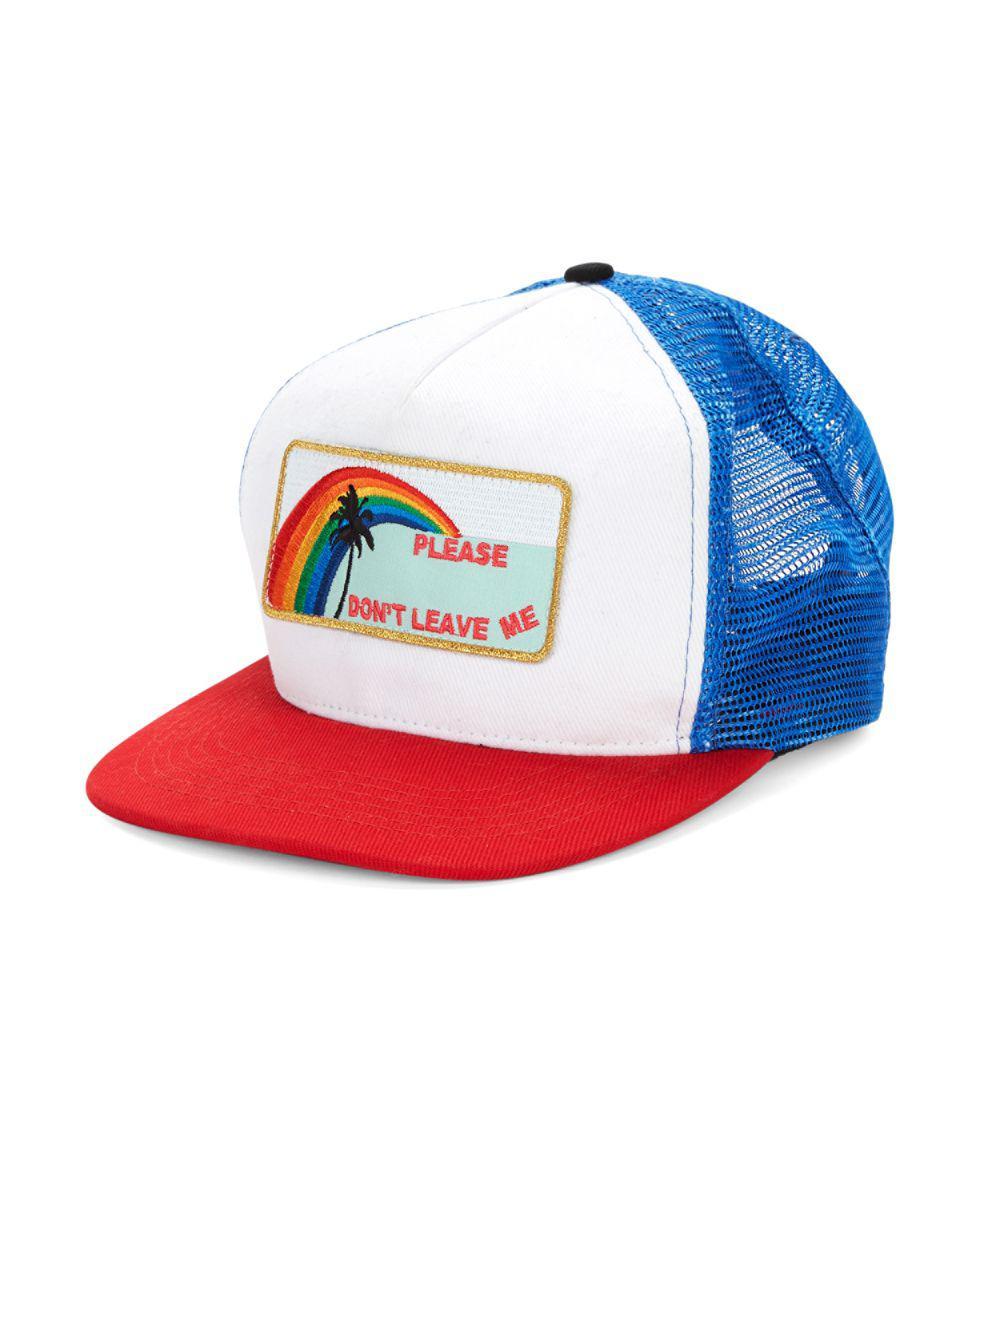 4cf1f2aedd600 Saint Laurent Please Don t Leave Me Trucker Hat in Blue for Men - Lyst